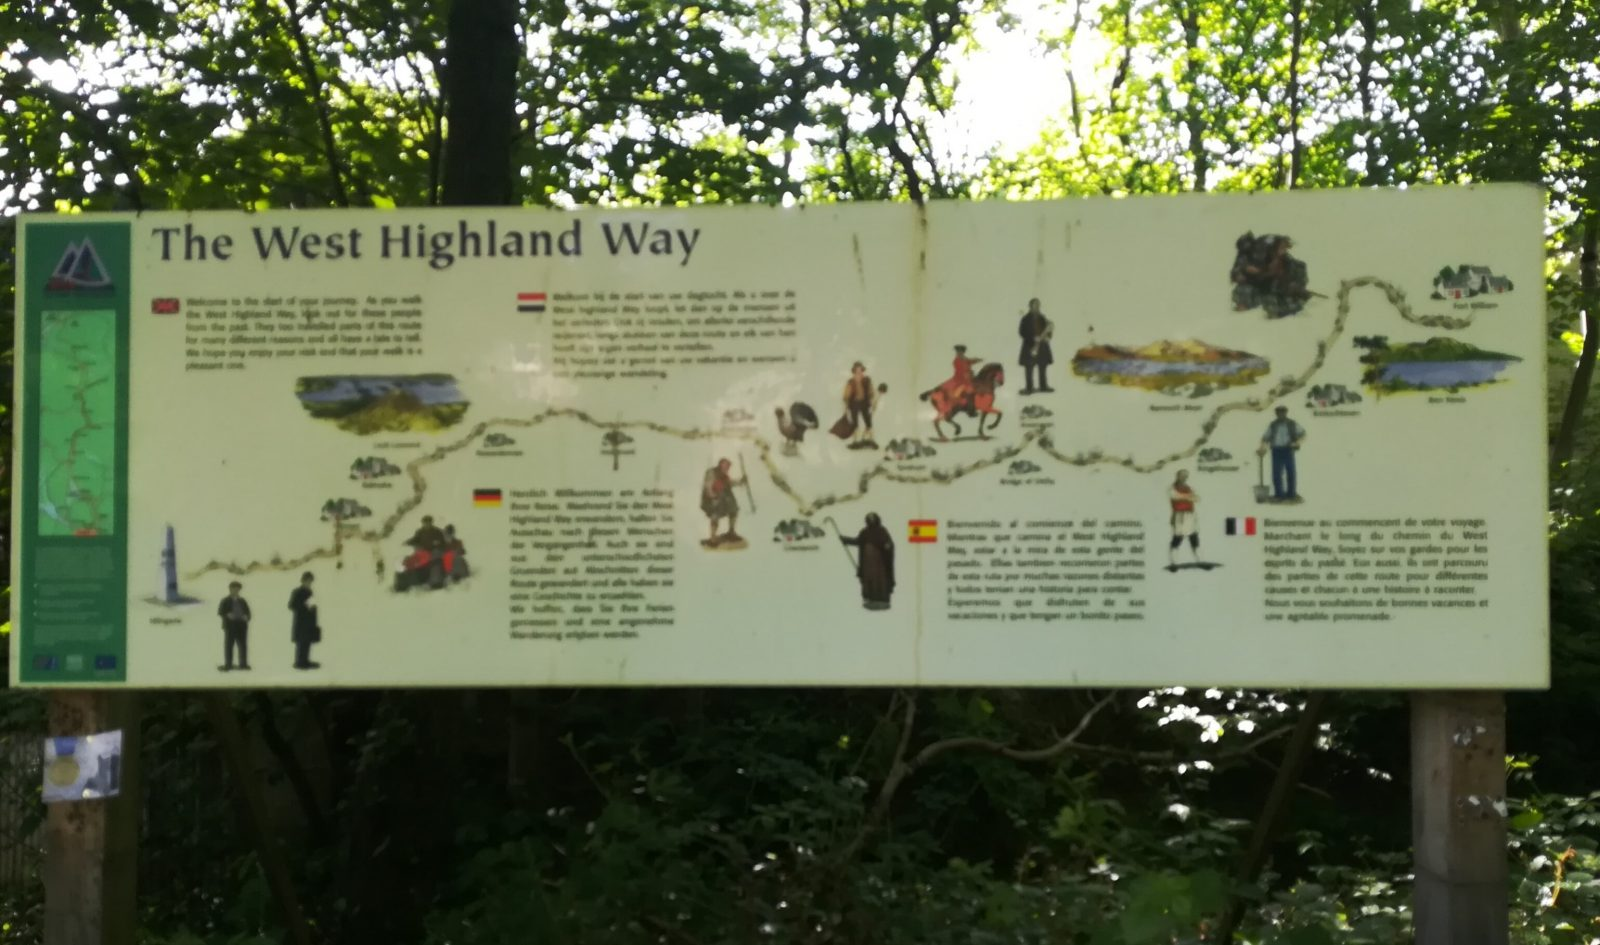 start of the West Highland Way in Milngavie